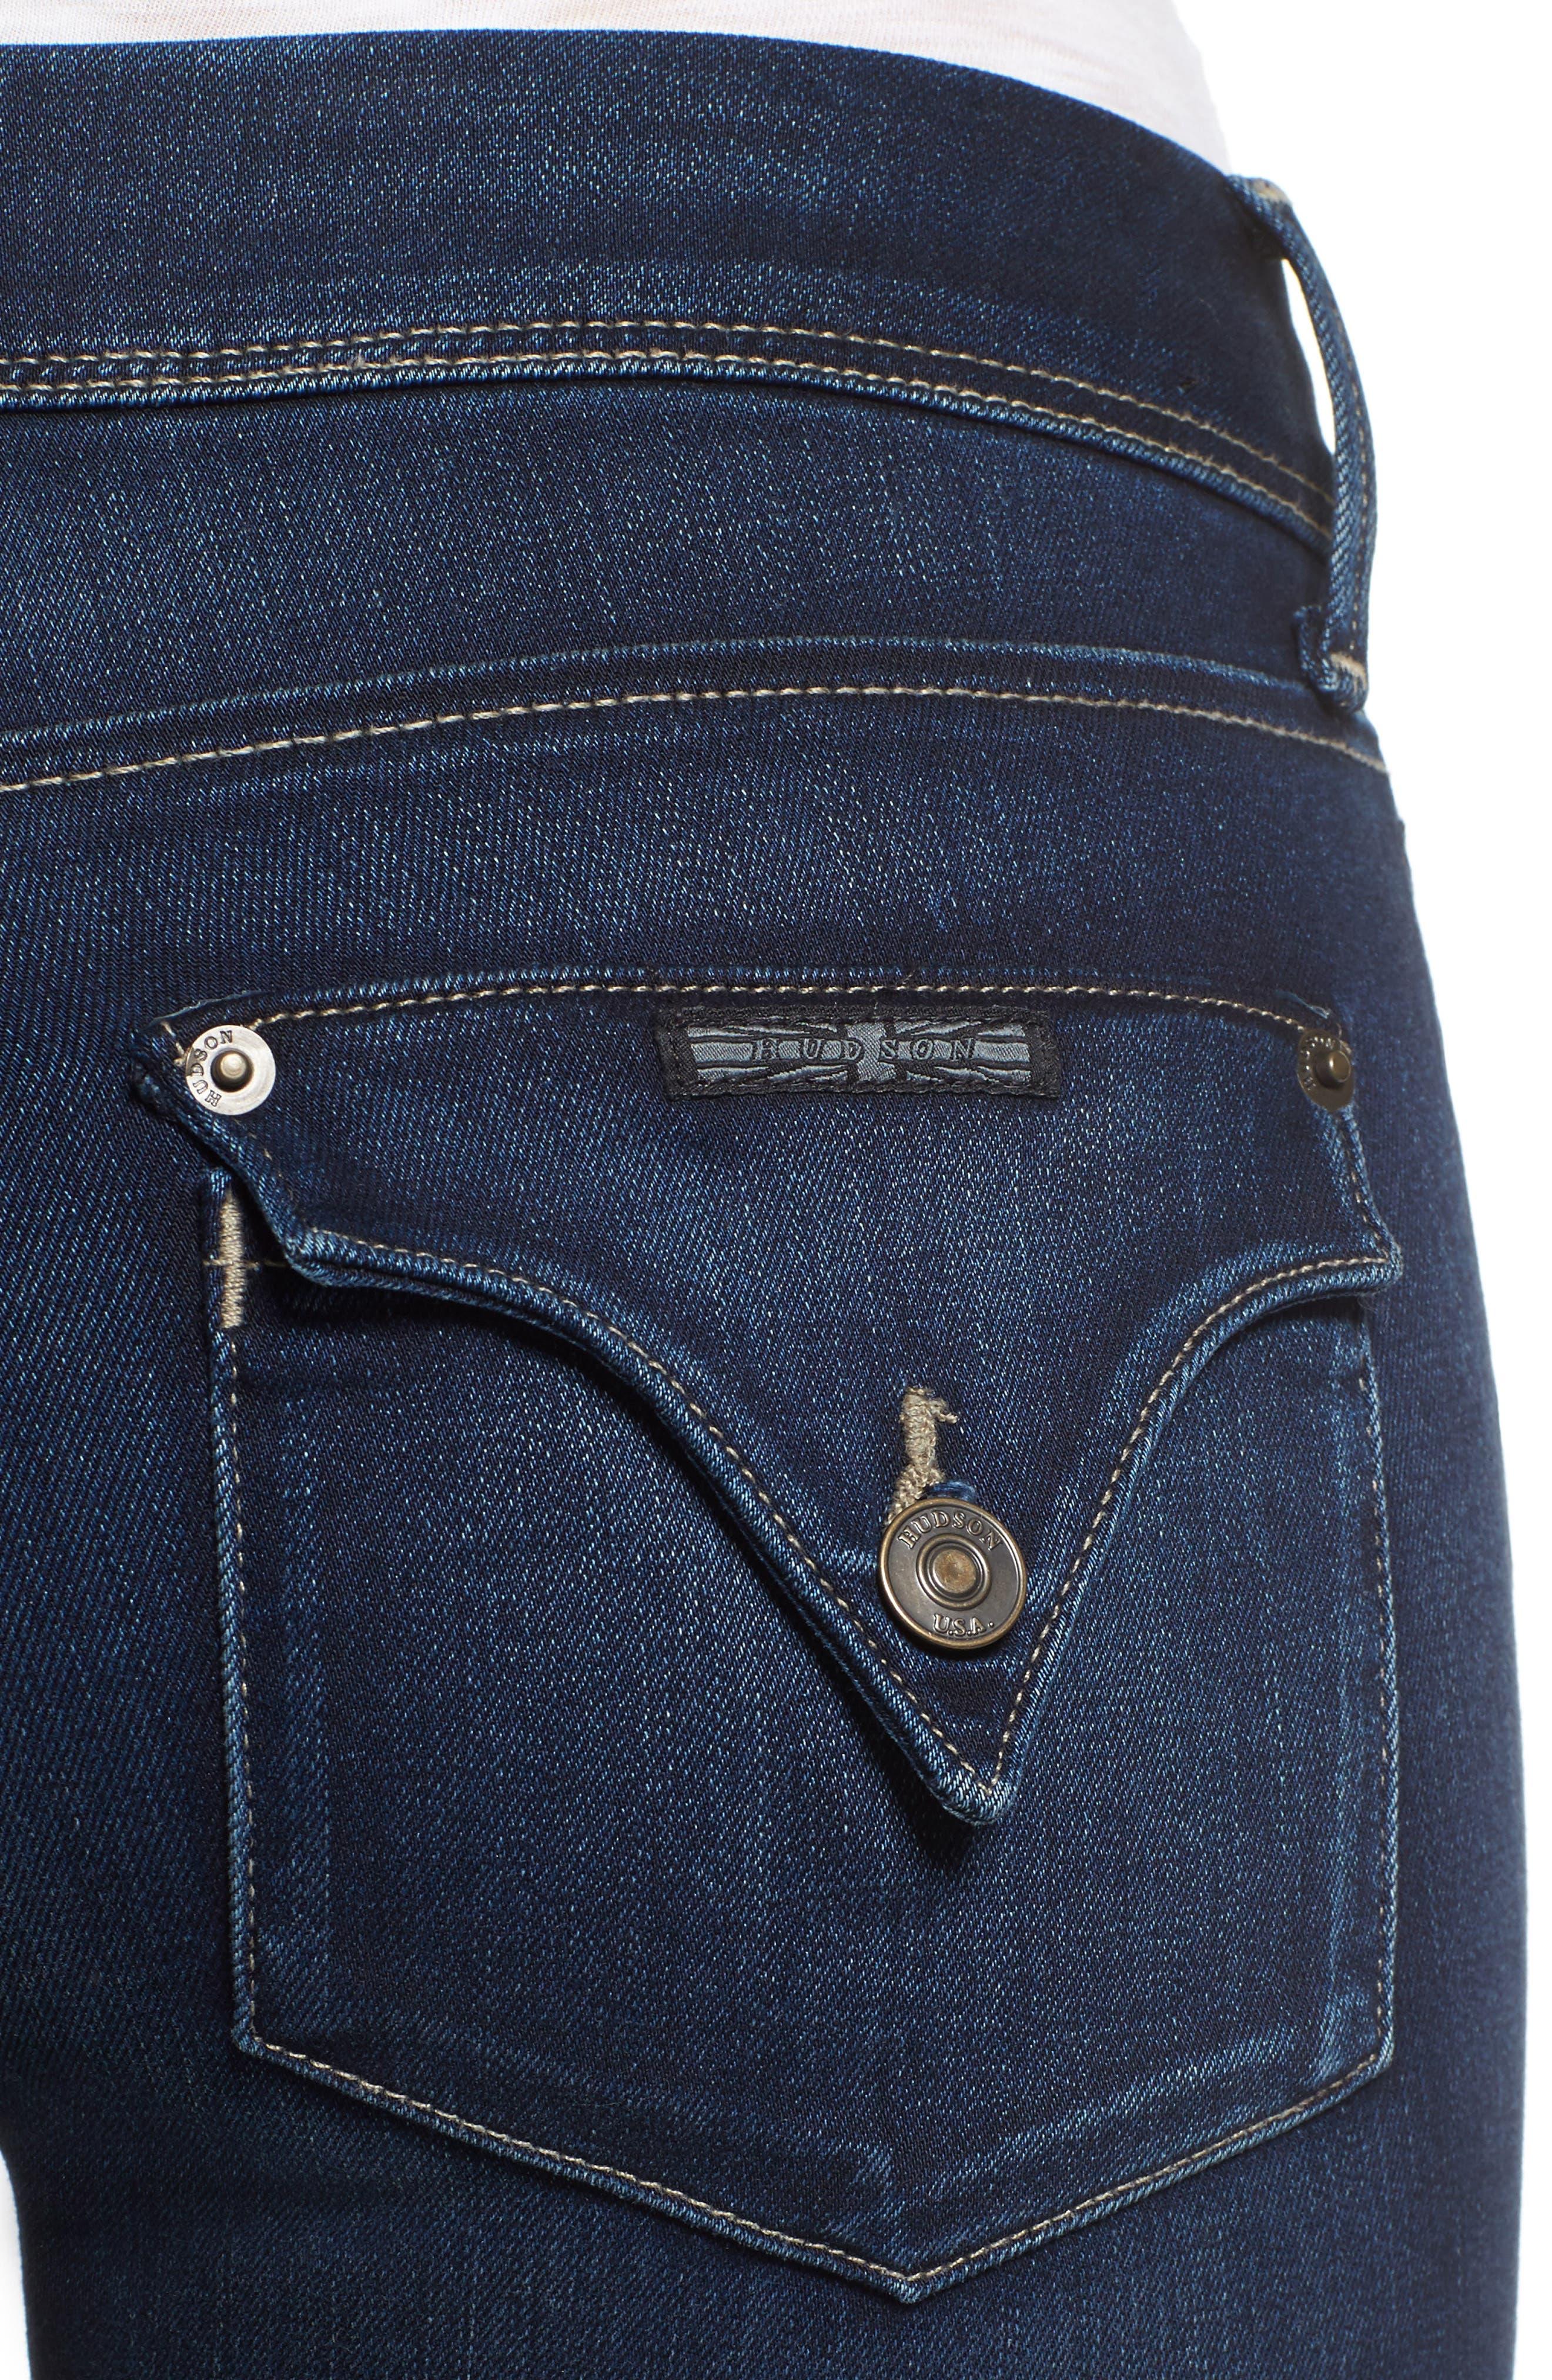 'Collin' Supermodel Skinny Jeans,                             Alternate thumbnail 4, color,                             CREST FALL